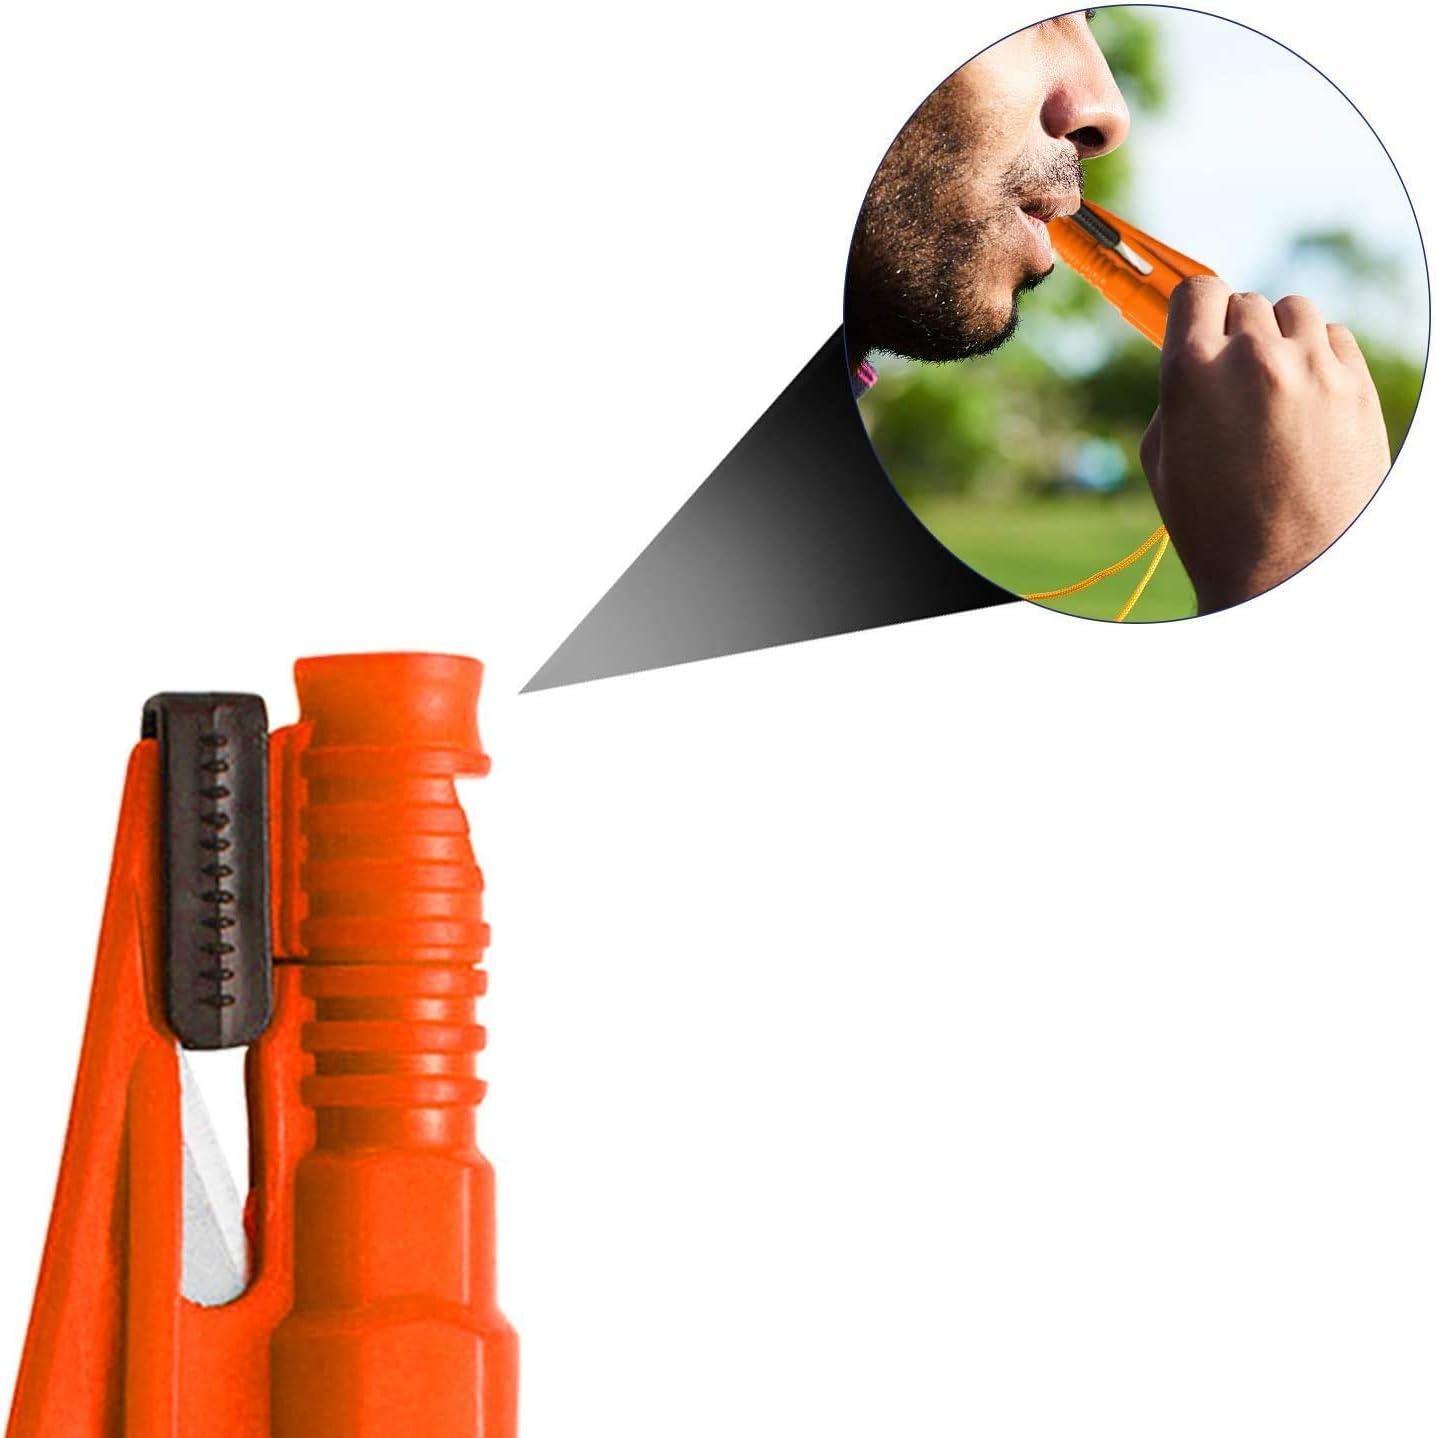 Emergency Escape Tool Glass Break Hammer Used for Escape 1pcs-balck 3 In 1 Car Life Keychain Car Emergency Hammer